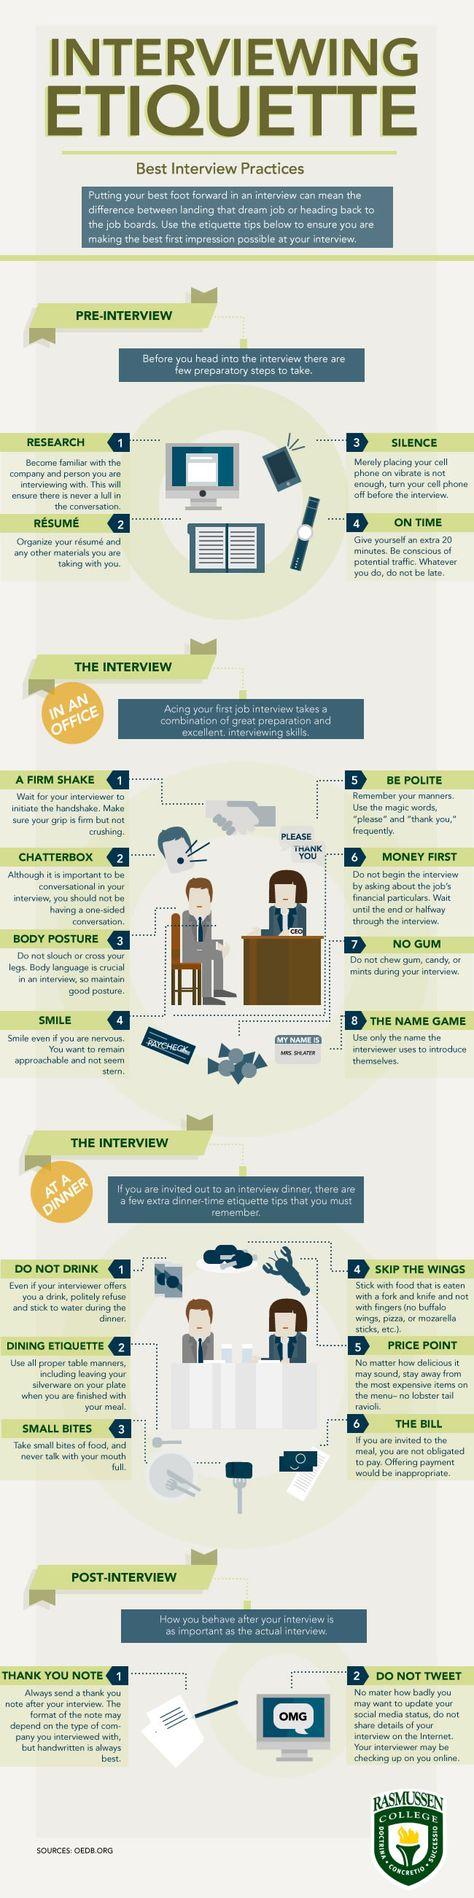 interview etiquette, successful interview, how to be successful in interview, good interview techniques.